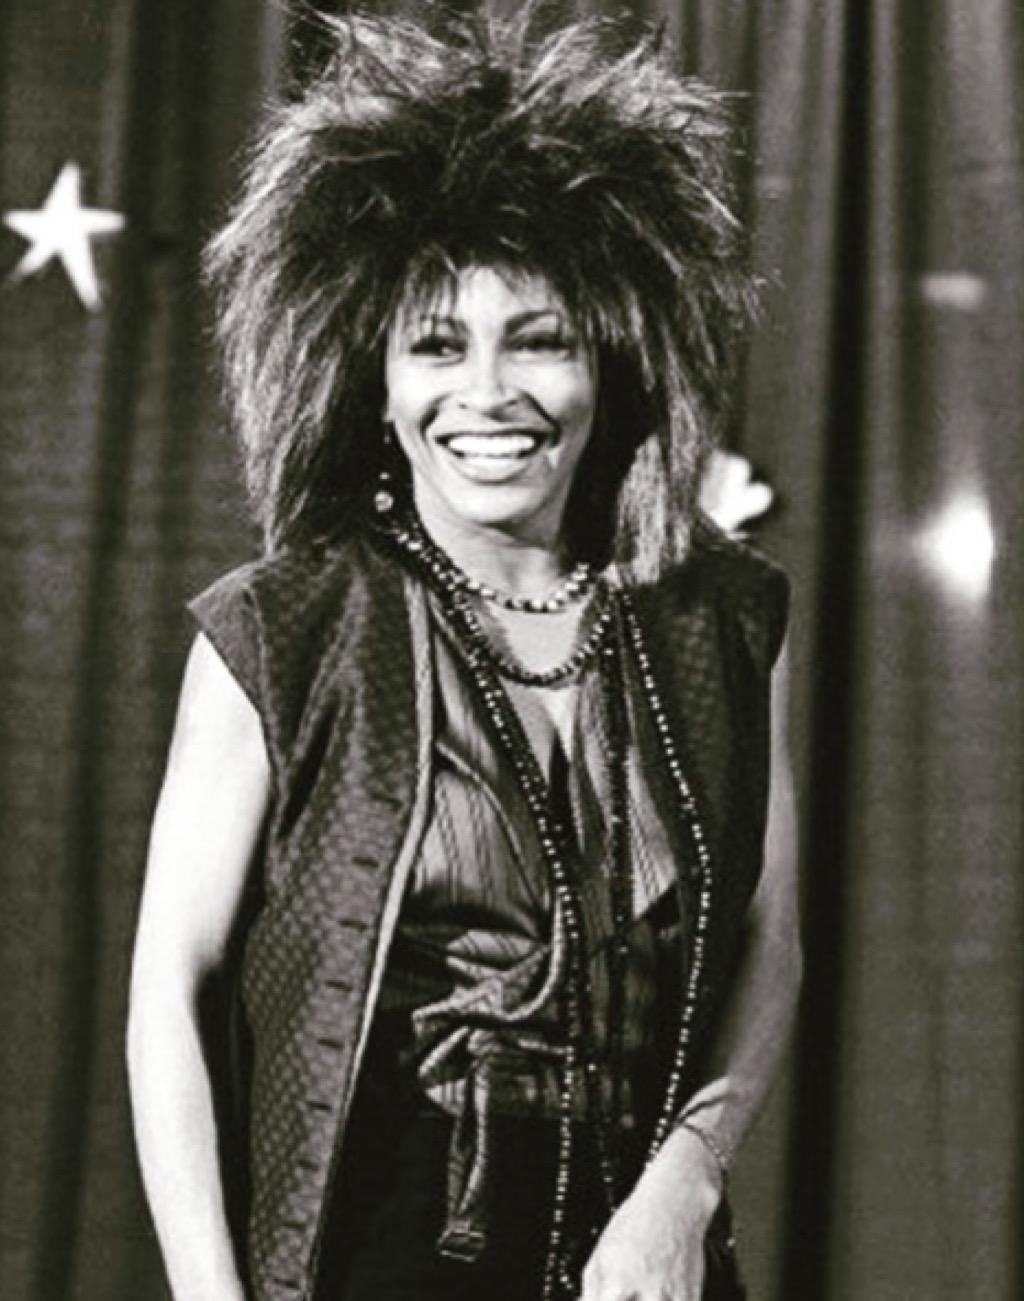 Tina Turner iconic hair